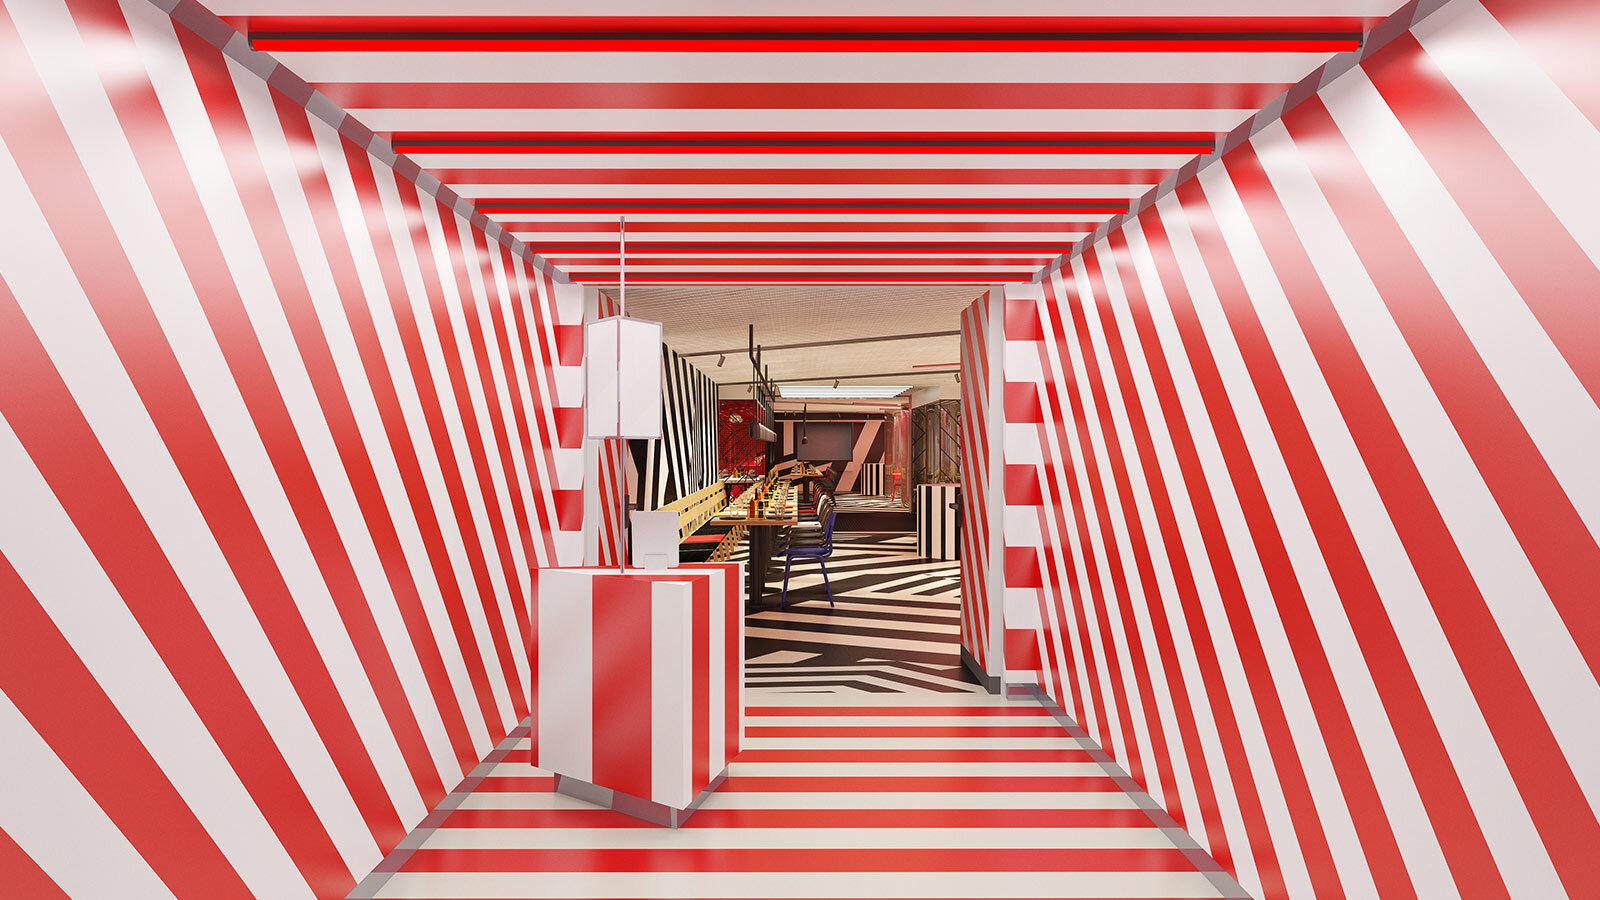 RDR-FNB-razzledazzle-restaurant-v1-01-1600x900-1.jpg